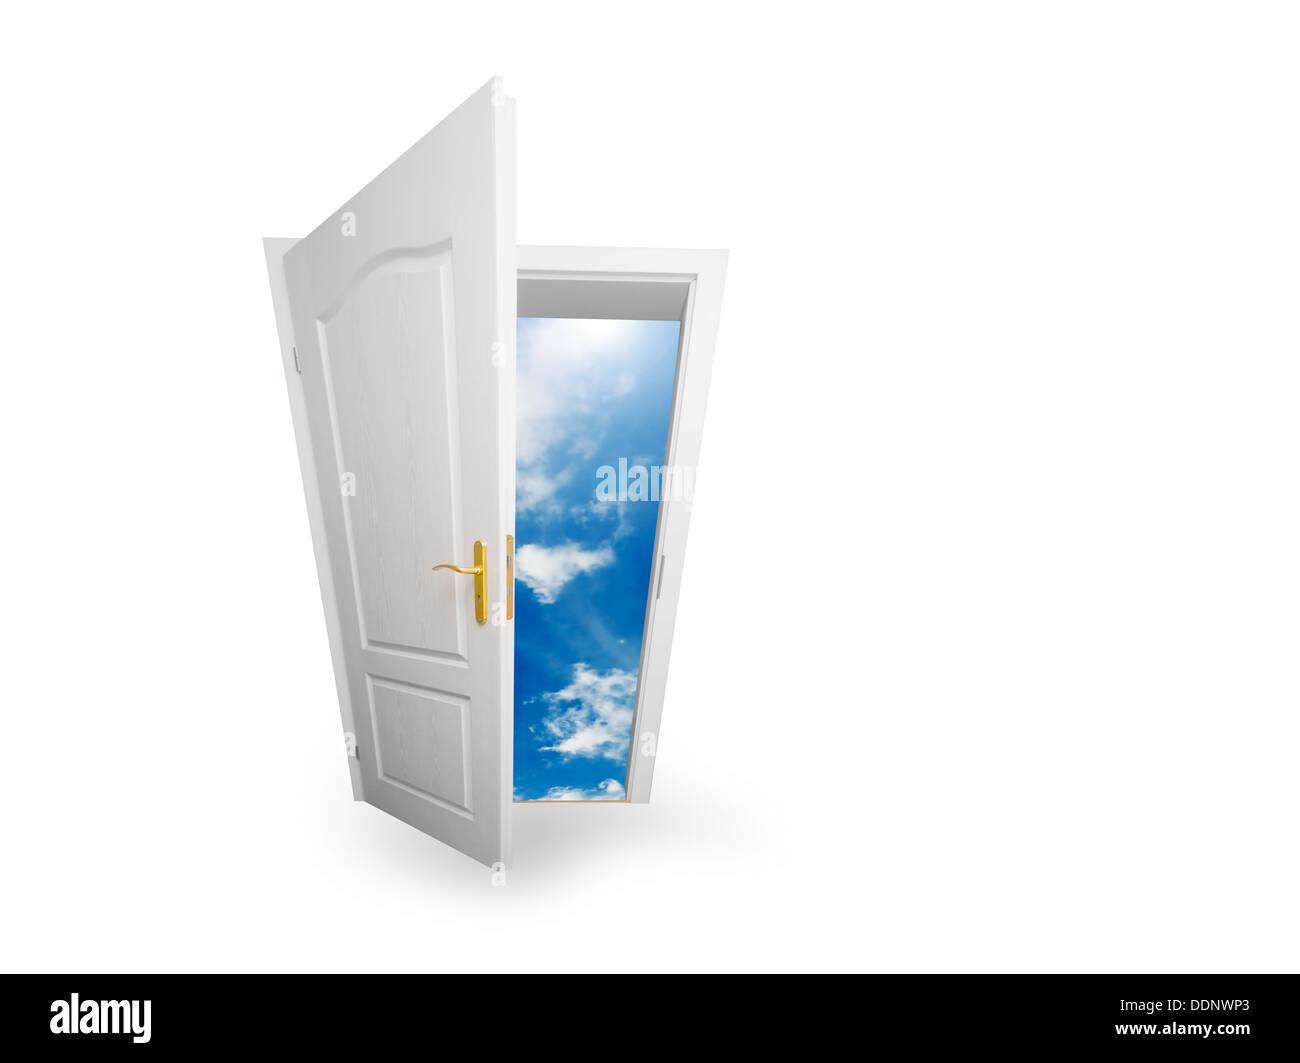 Open door to new world / future / dreams/ hope / heaven concept - Stock Image